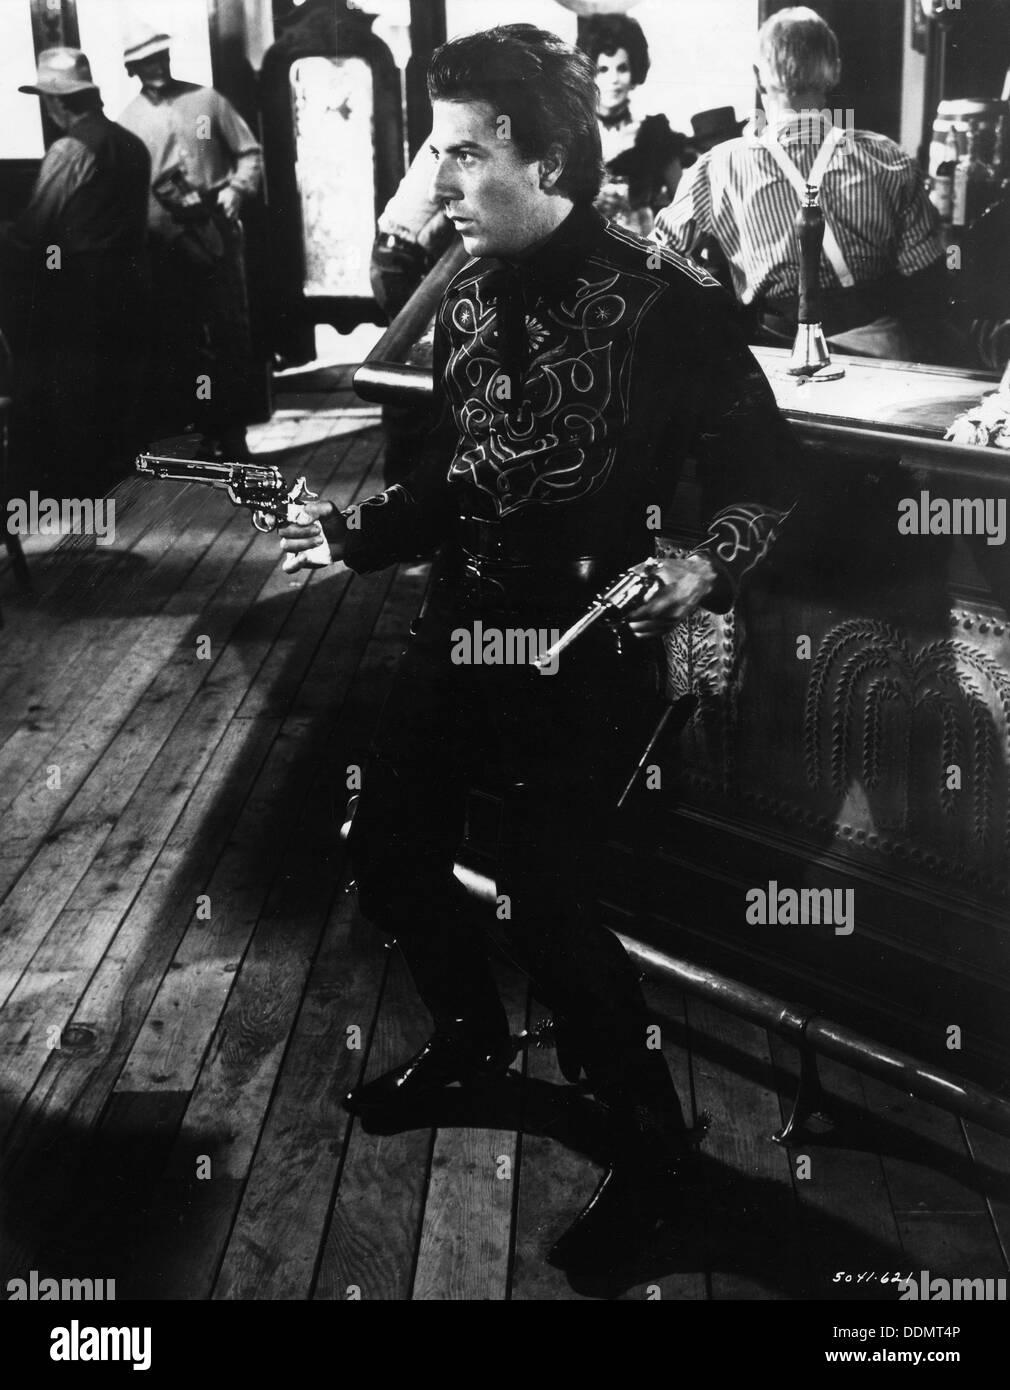 Dustin Hoffman (1937- ), American actor, 1970. - Stock Image